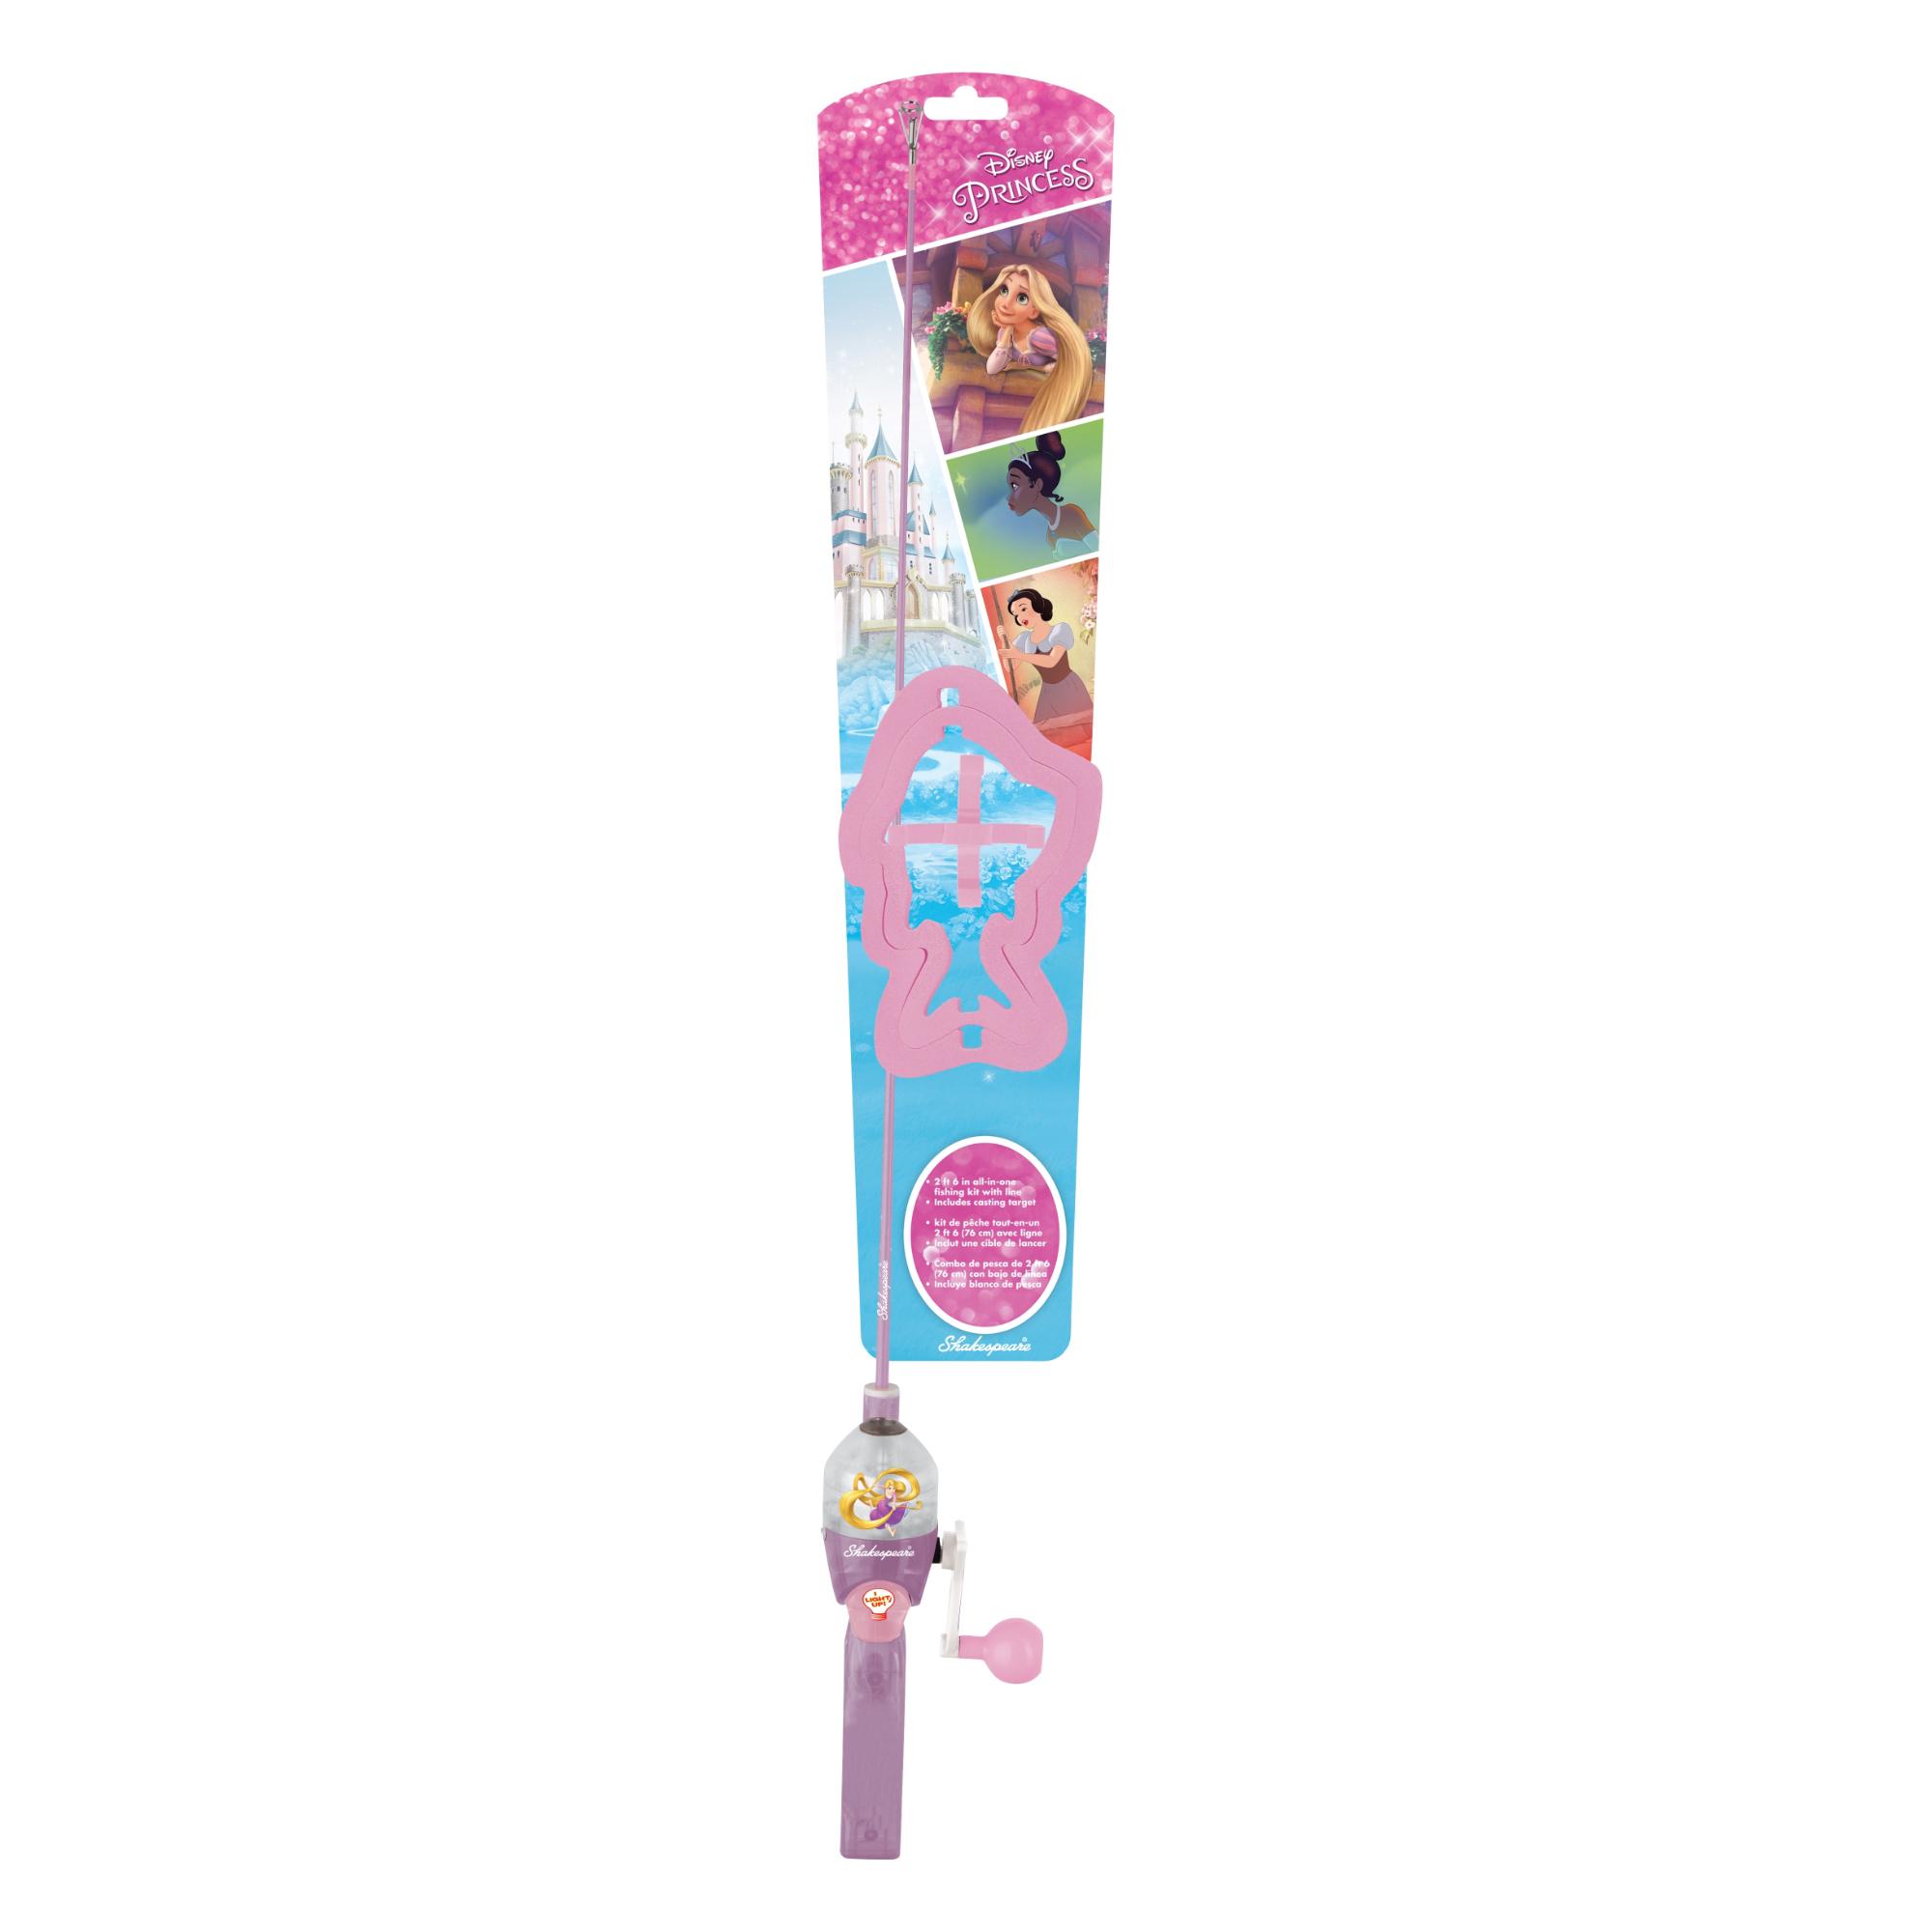 Shakespeare Disney Princess Spincast Combo Lighted Kit 2'6″ Medium 1-Pc.